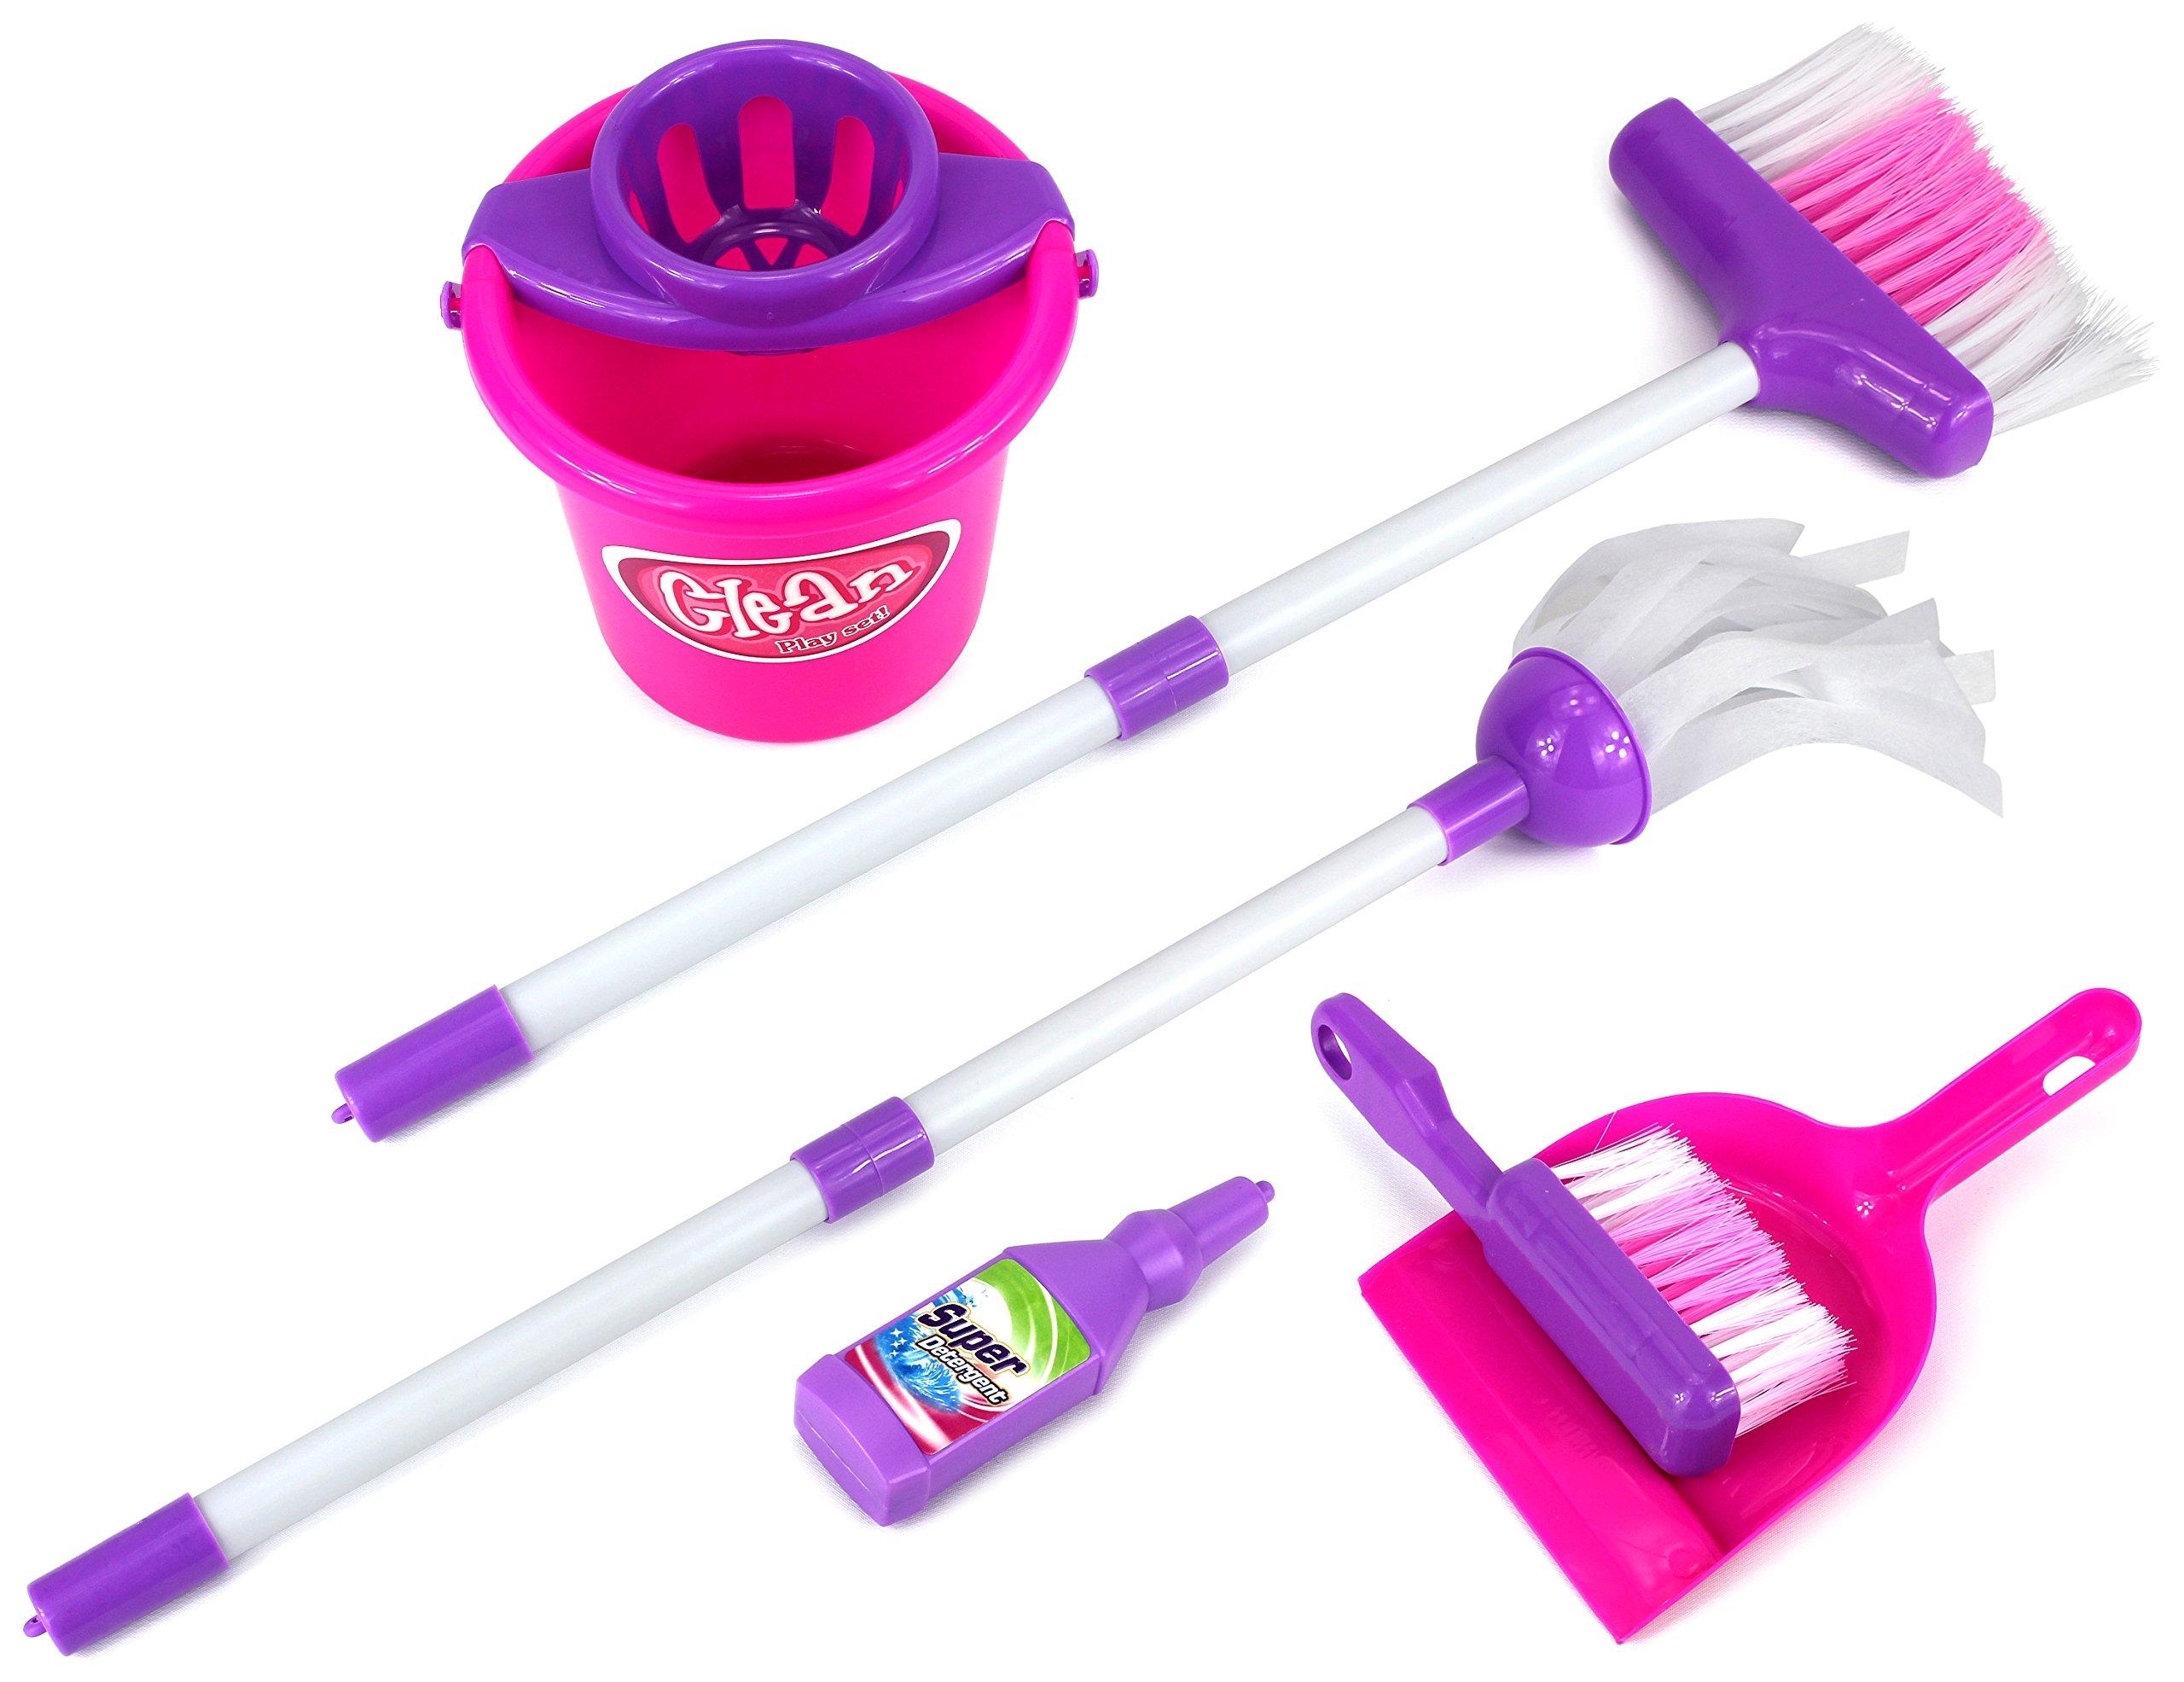 Velocity Toys Little Helper 'E' Deluxe Children's Kid's Pretend Play Toy Cleaning Play Set w/ Broom, Mop, Bucket, Dust Pan, Brush, Mock Soap Bottle